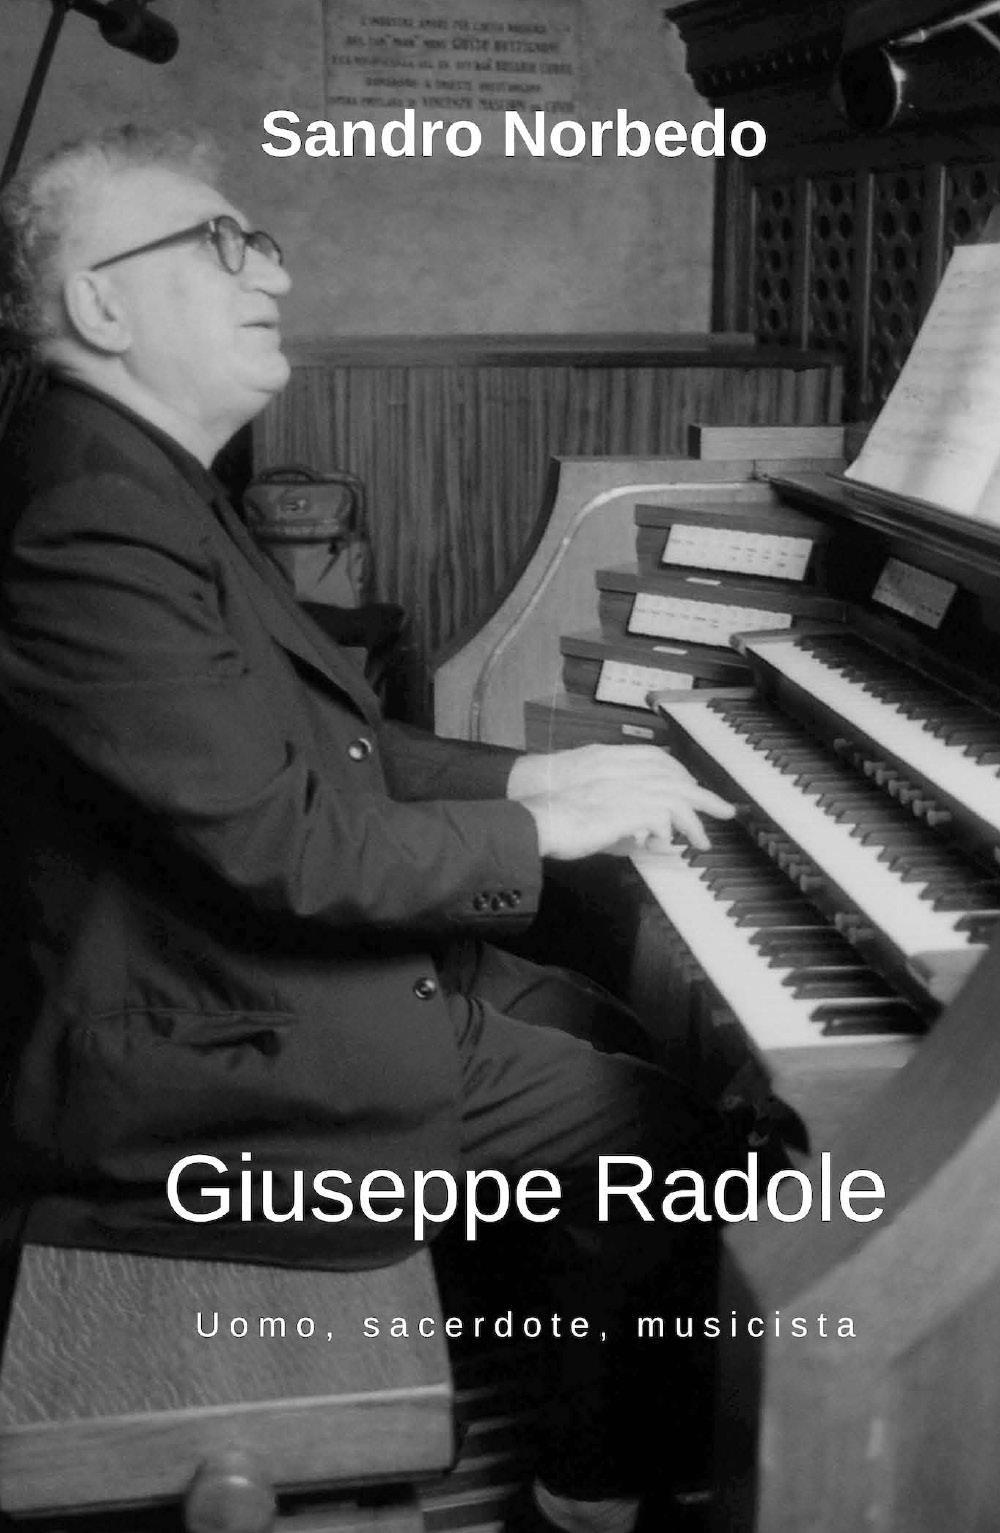 Giuseppe Radole - Uomo, sacerdote, musicista